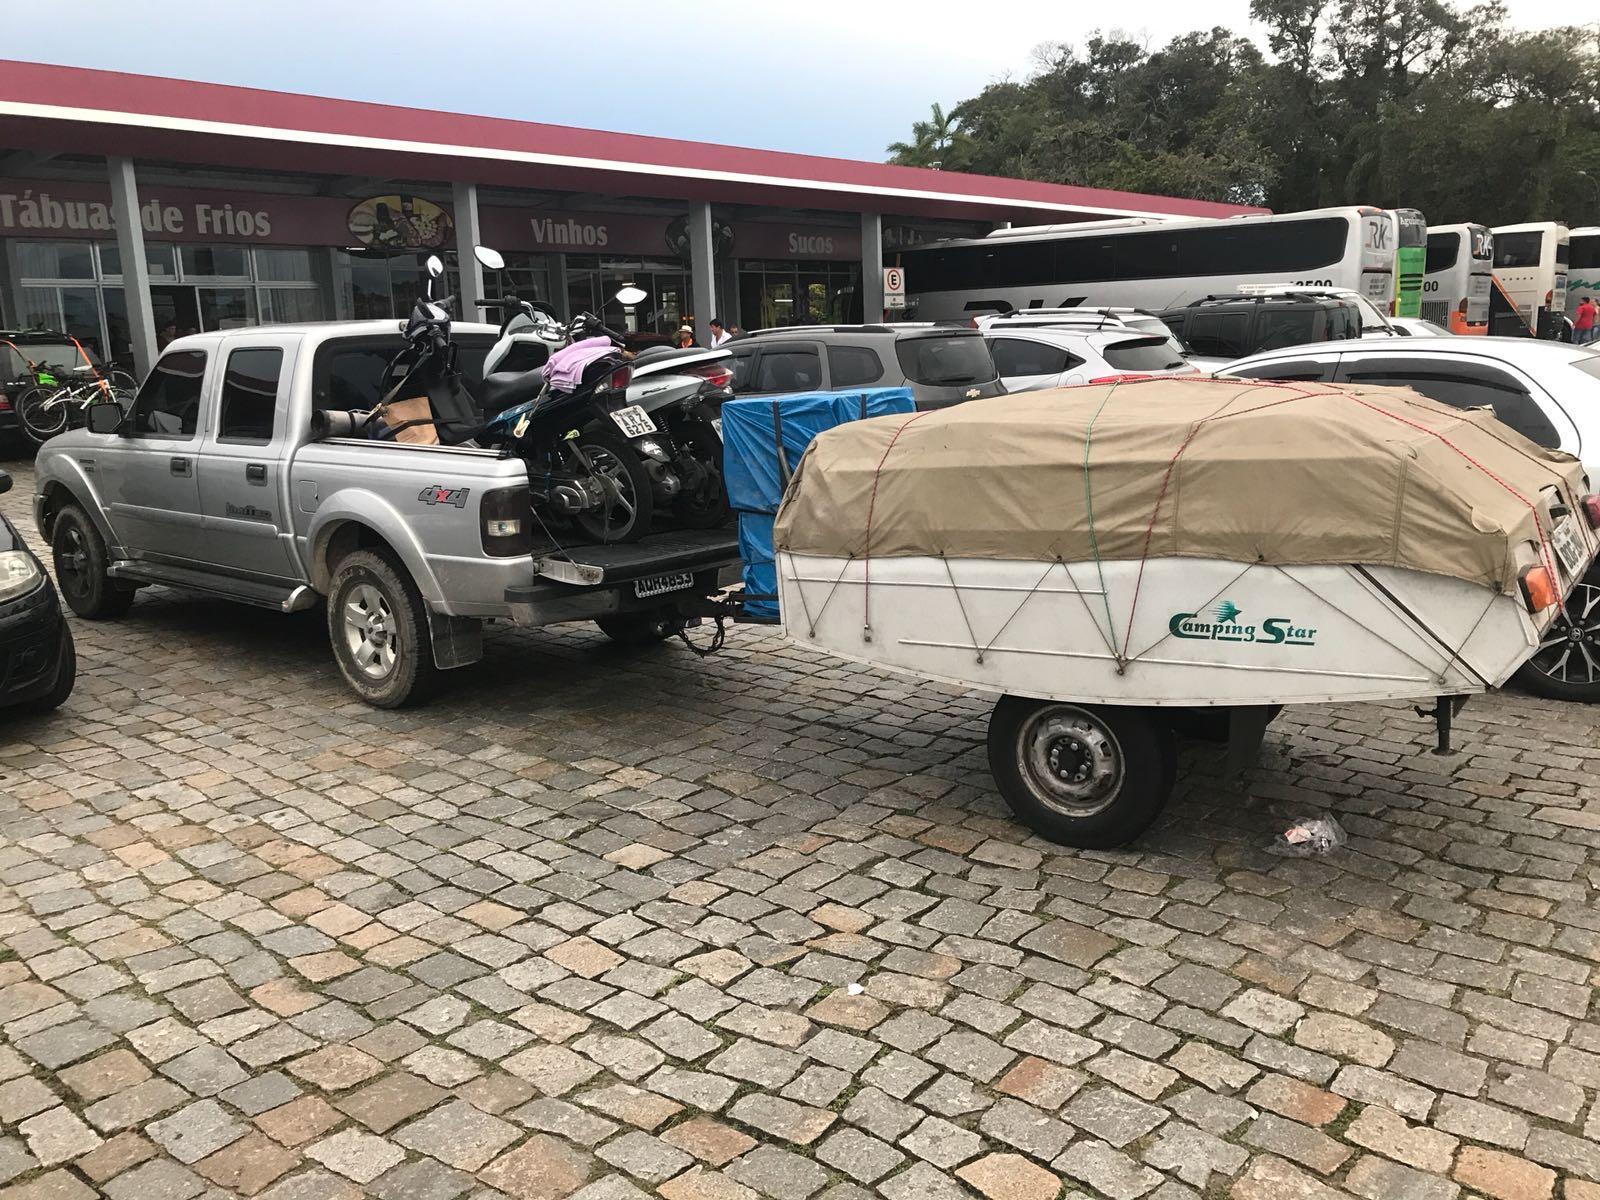 Última da camping star